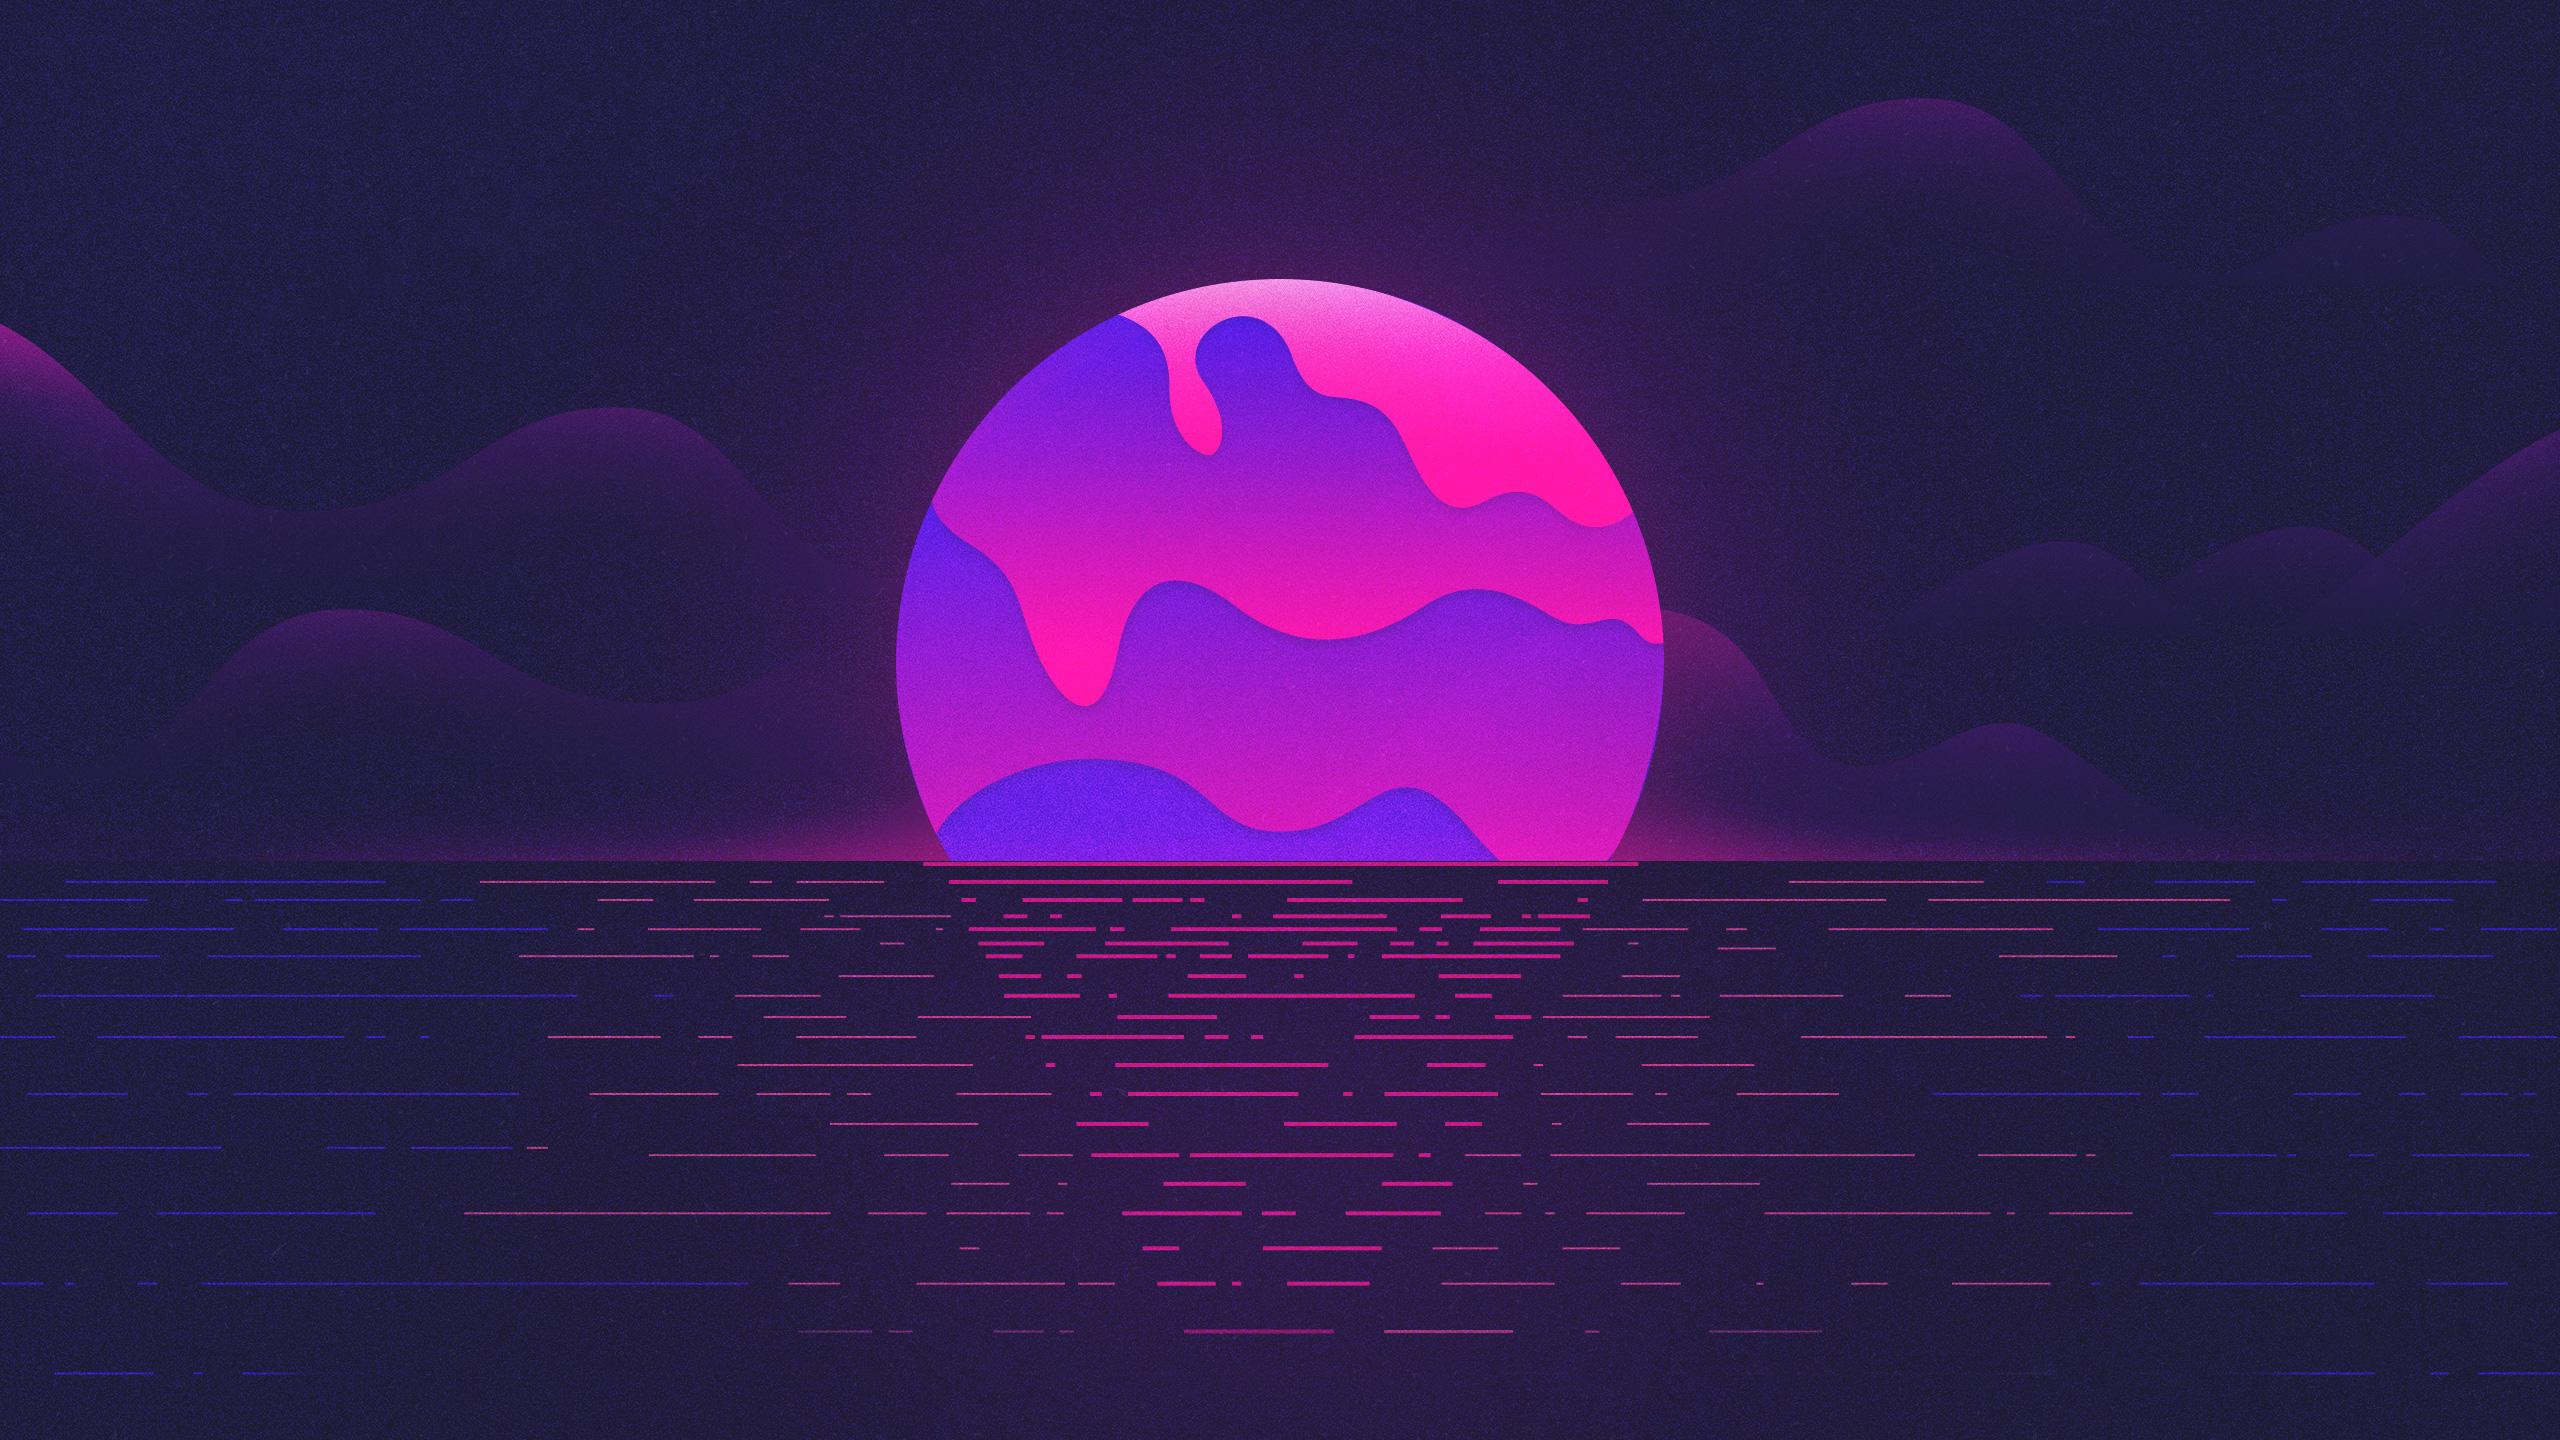 Vaporwave Sunset Hd Wallpaper Background Image 2560x1440 Id